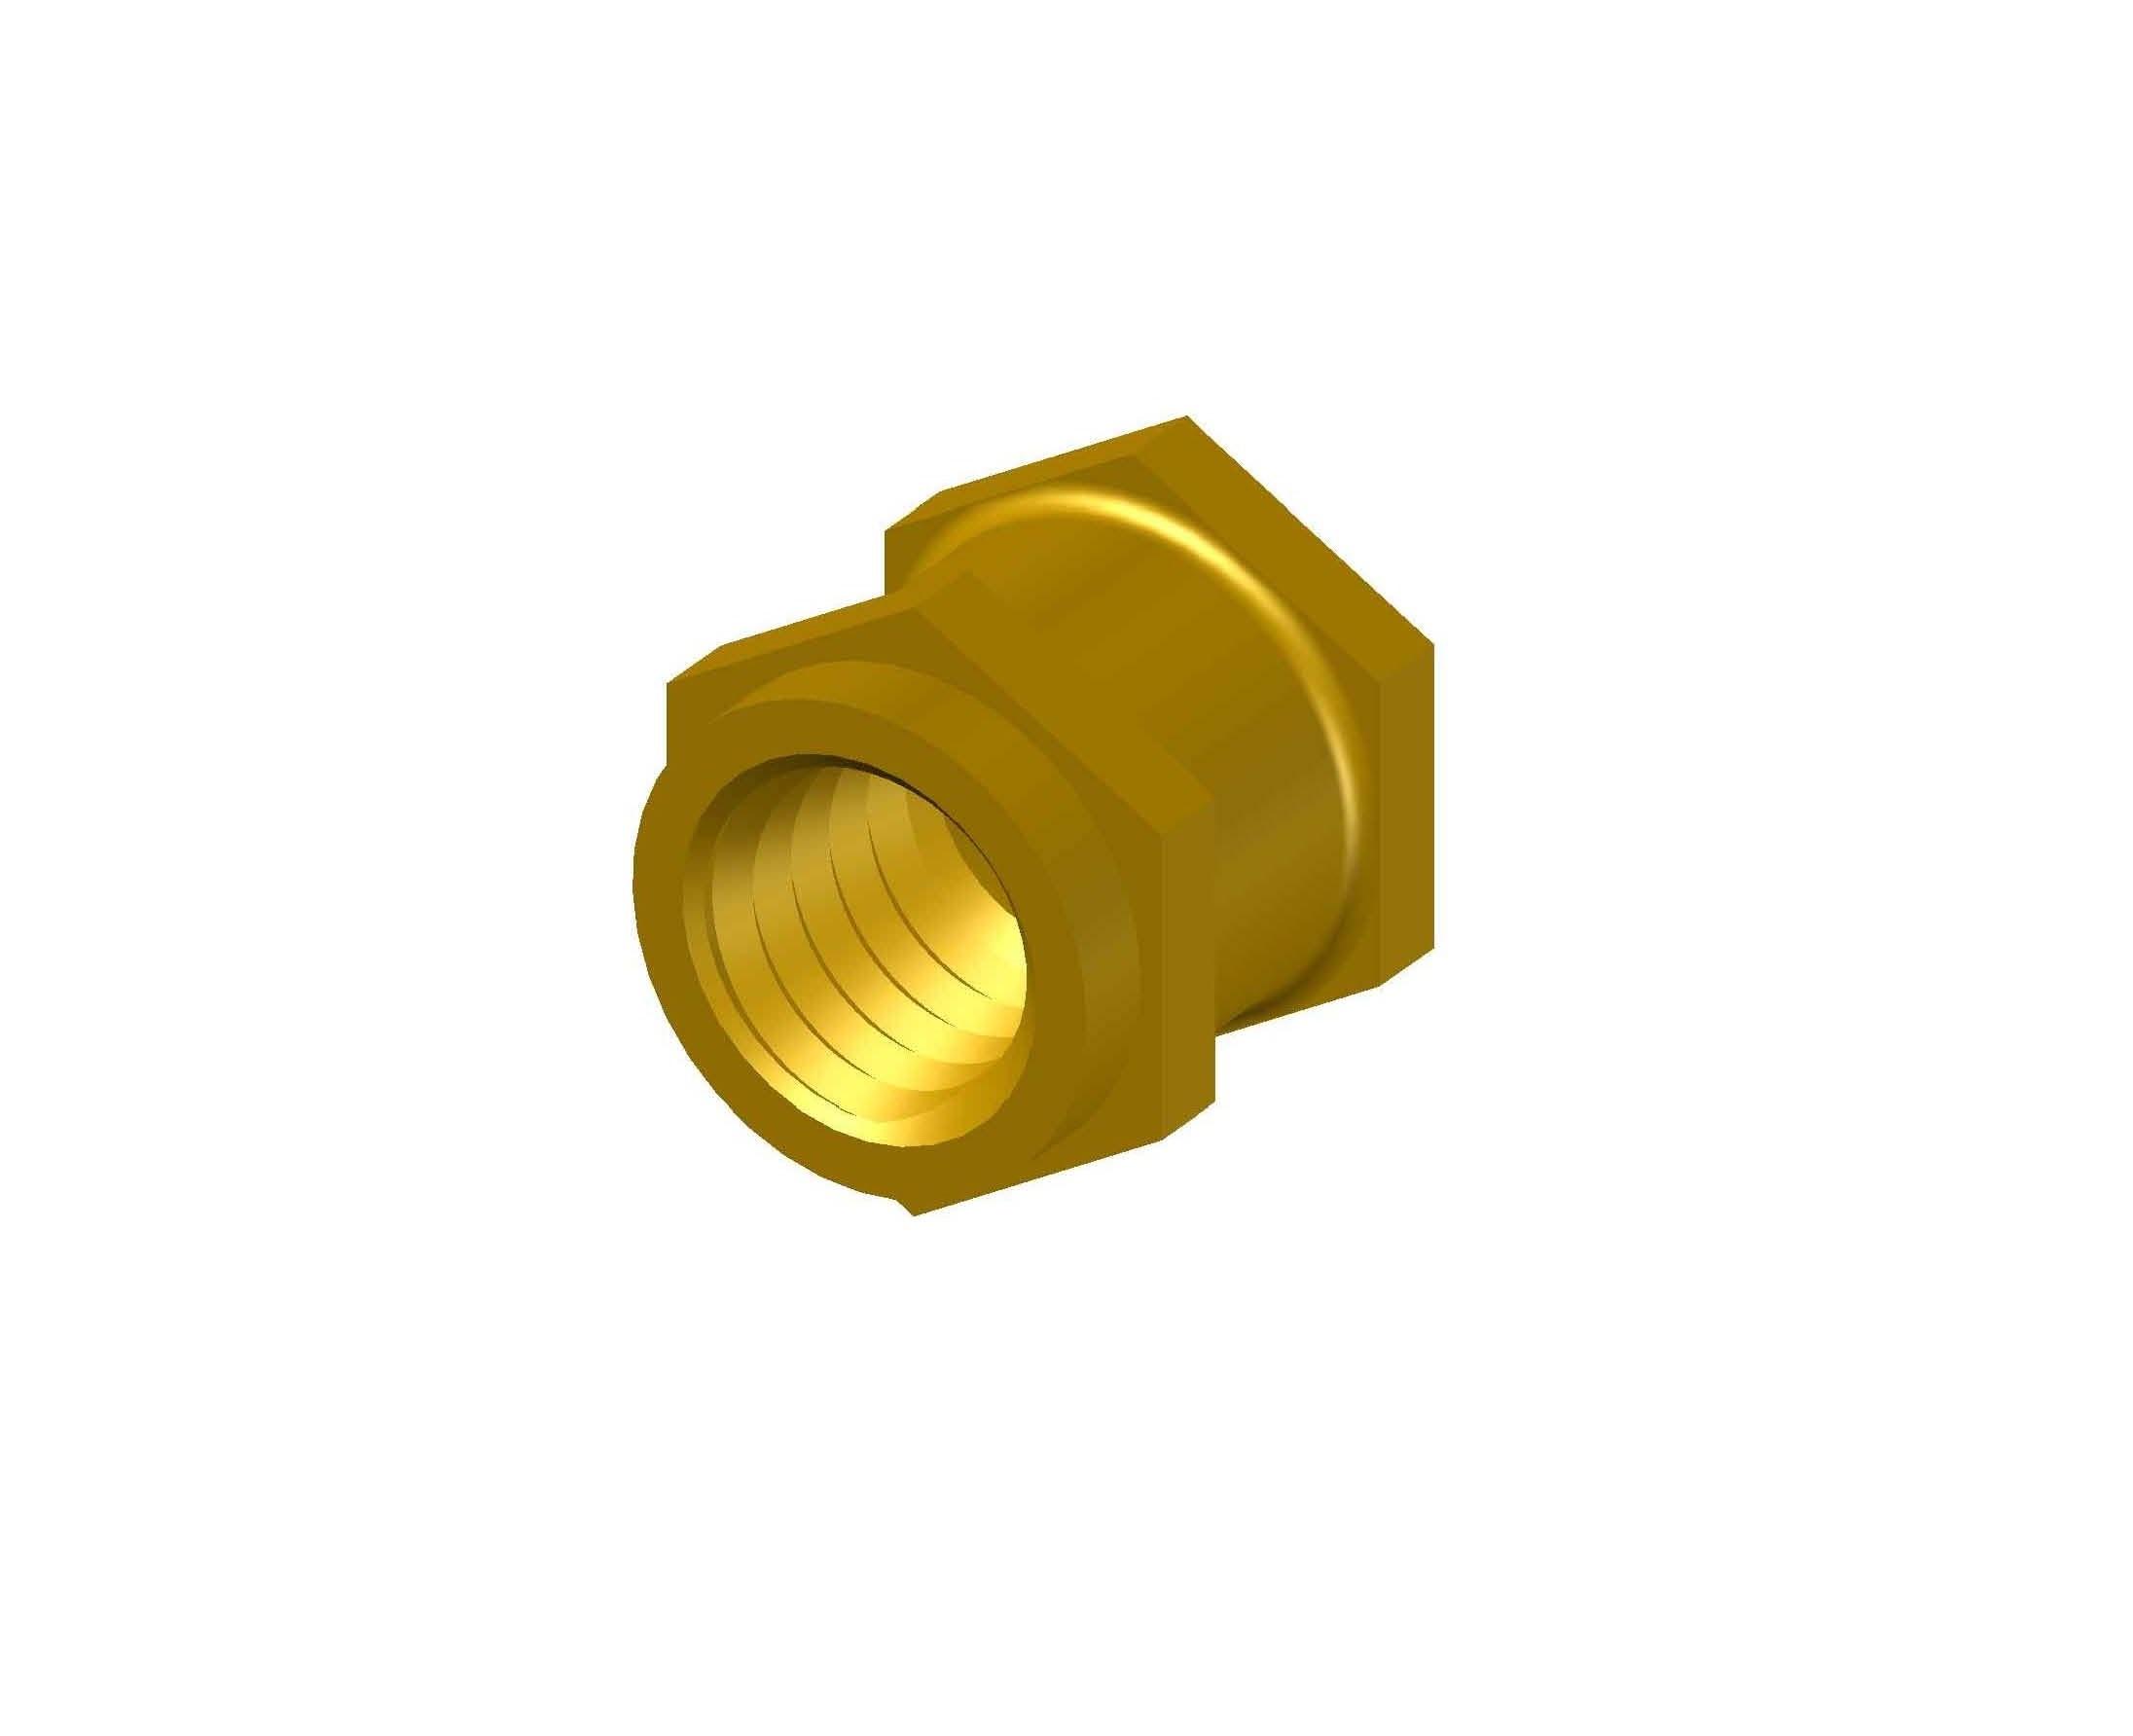 Brass Blind Hexagonal Insert